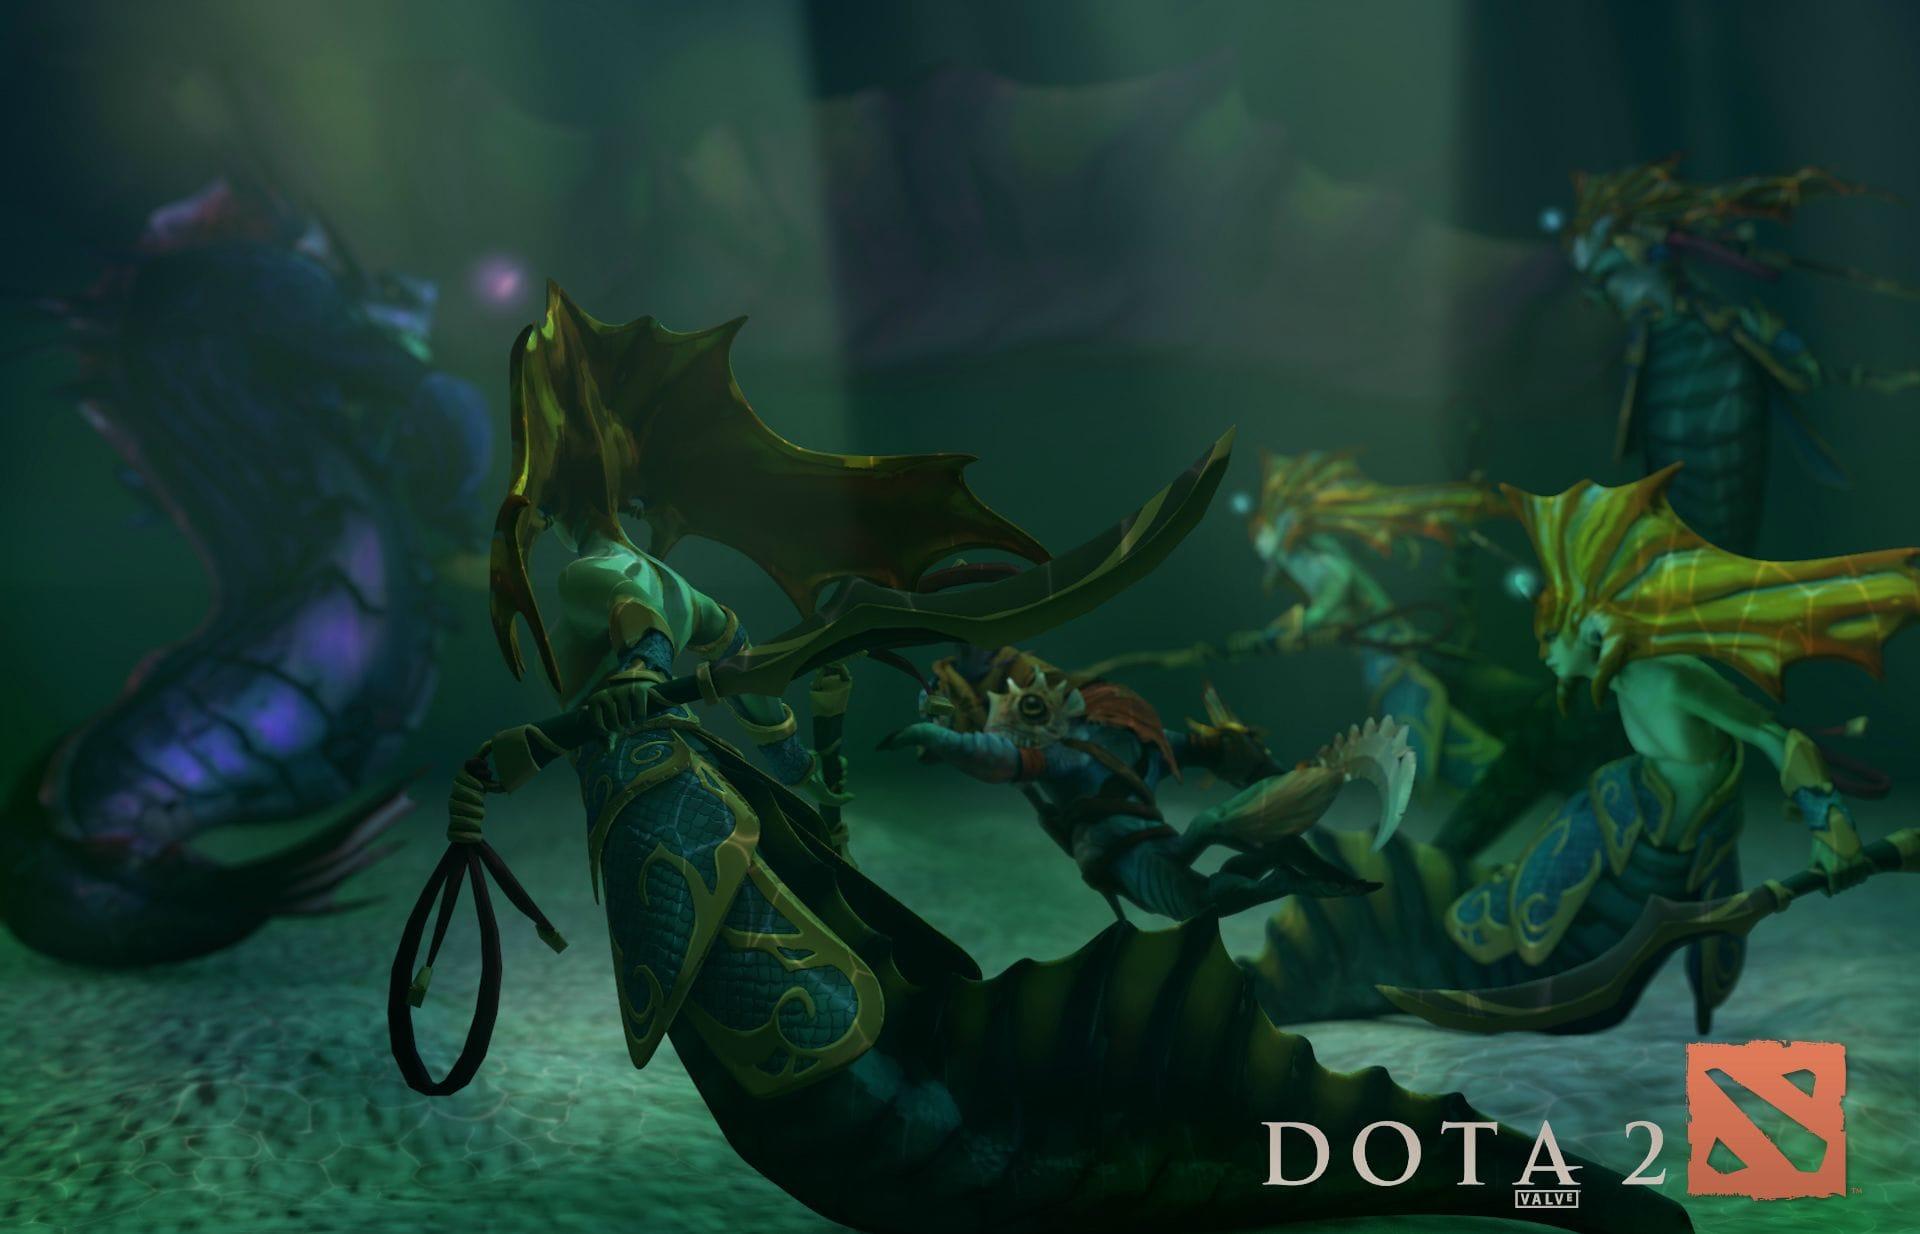 Dota2 : Slardar desktop wallpaper